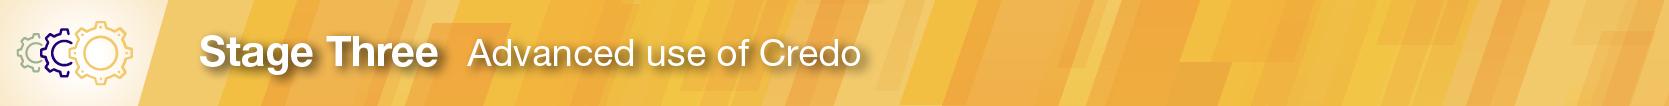 CredoInInstruction_SectionHead_801x51 Stage3_v2 (1)